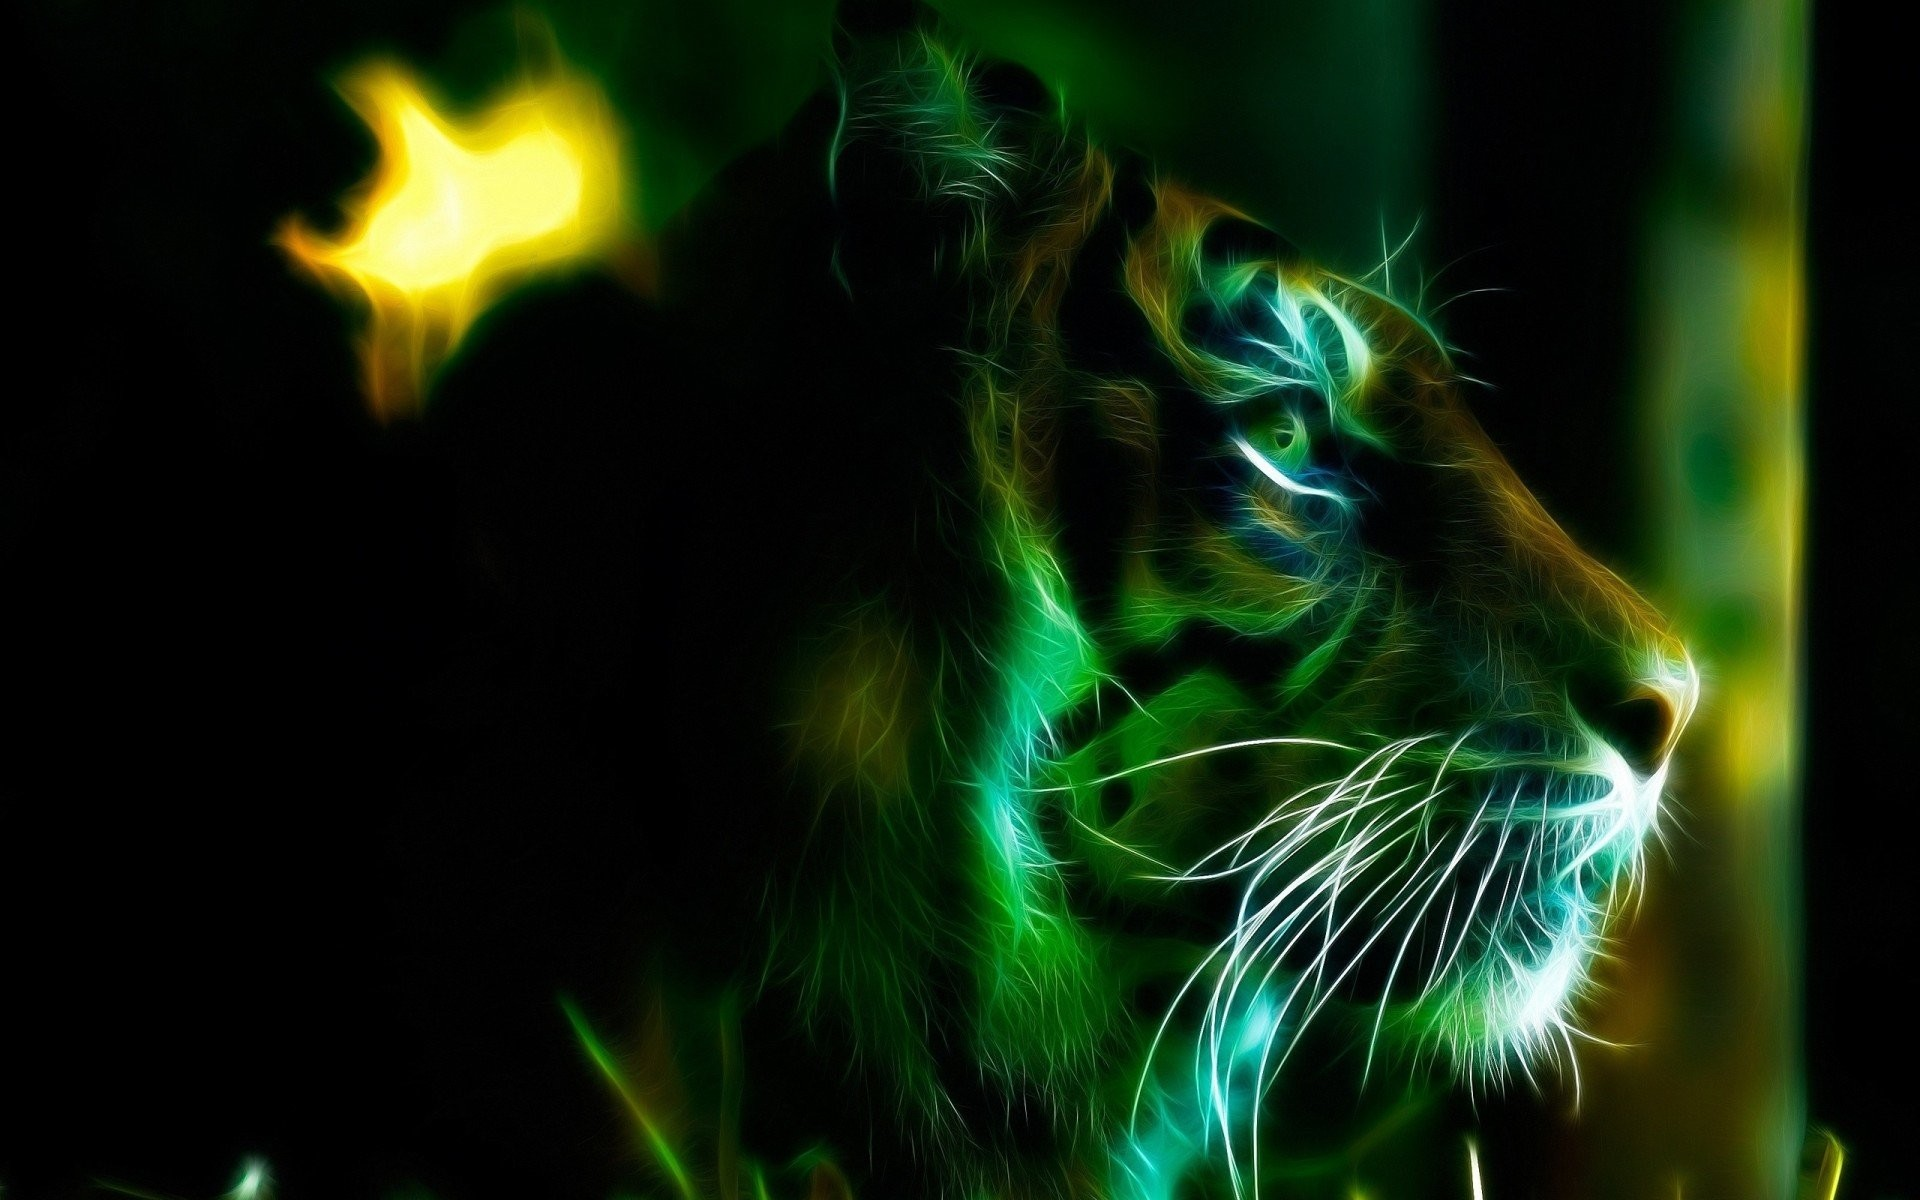 Green Tiger Photos Wallpaper HD » Download Wallpaper 1600×1200 Green Tiger  Wallpapers (43